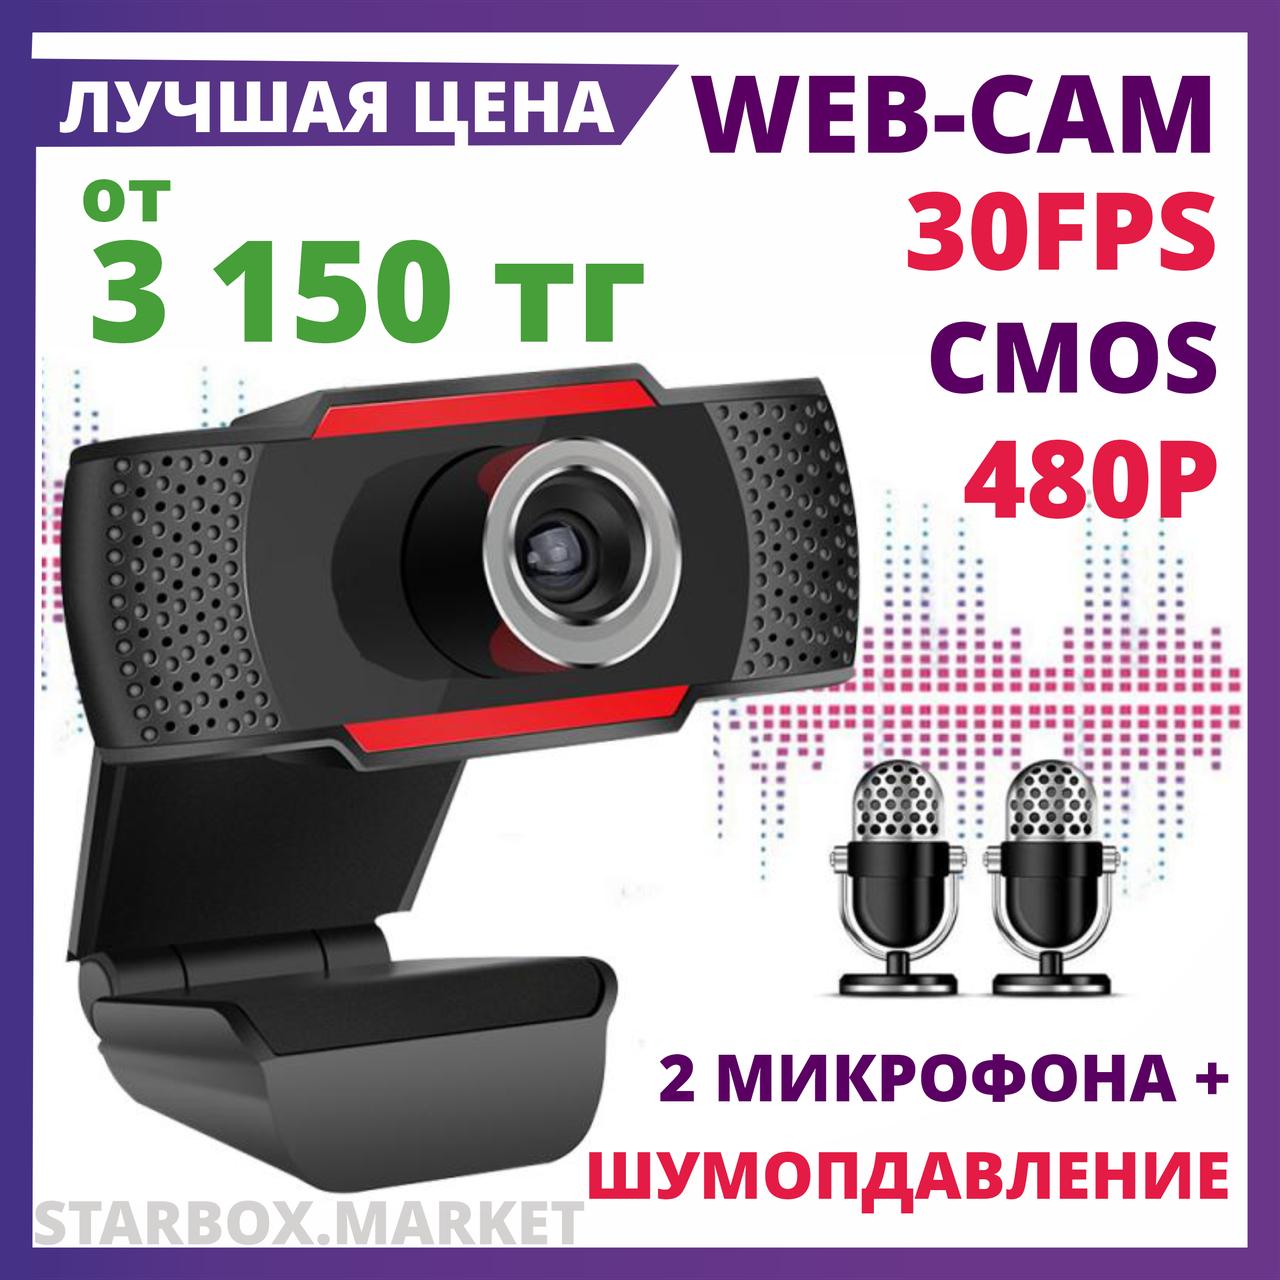 Веб камера с микрофоном 480P, интернет web камера для ПК компьютера, ноутбука USB Plug n Play стрим камера